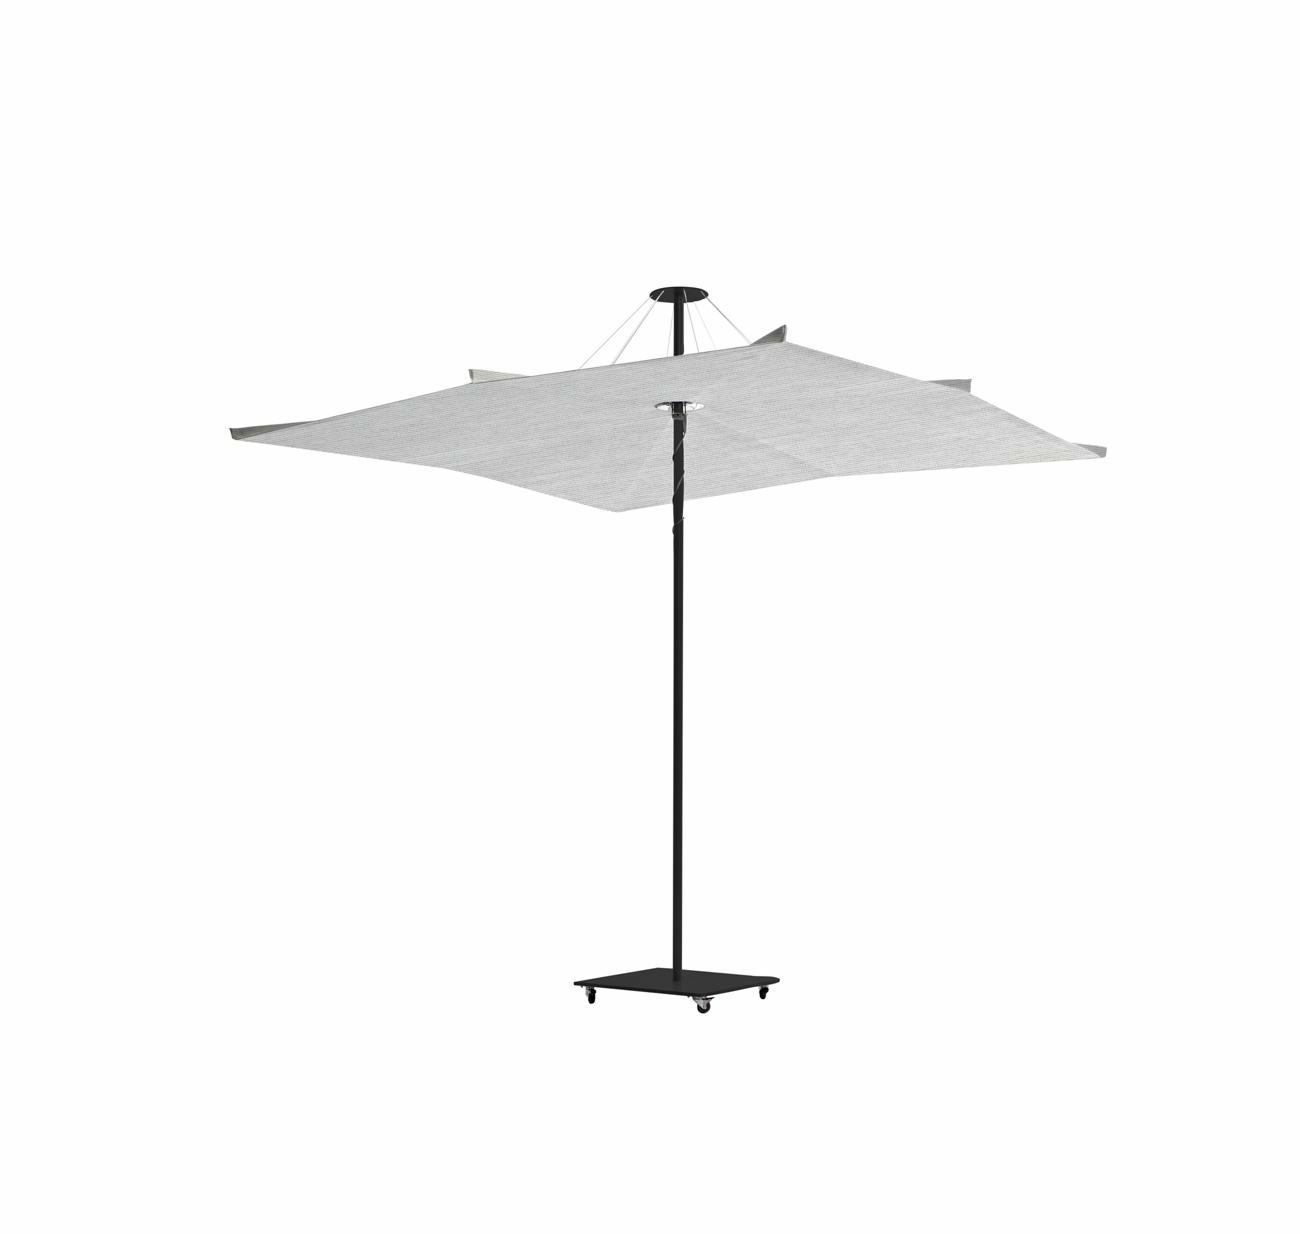 Infina parasol de jardin ǀ Base Mobile en Dusk